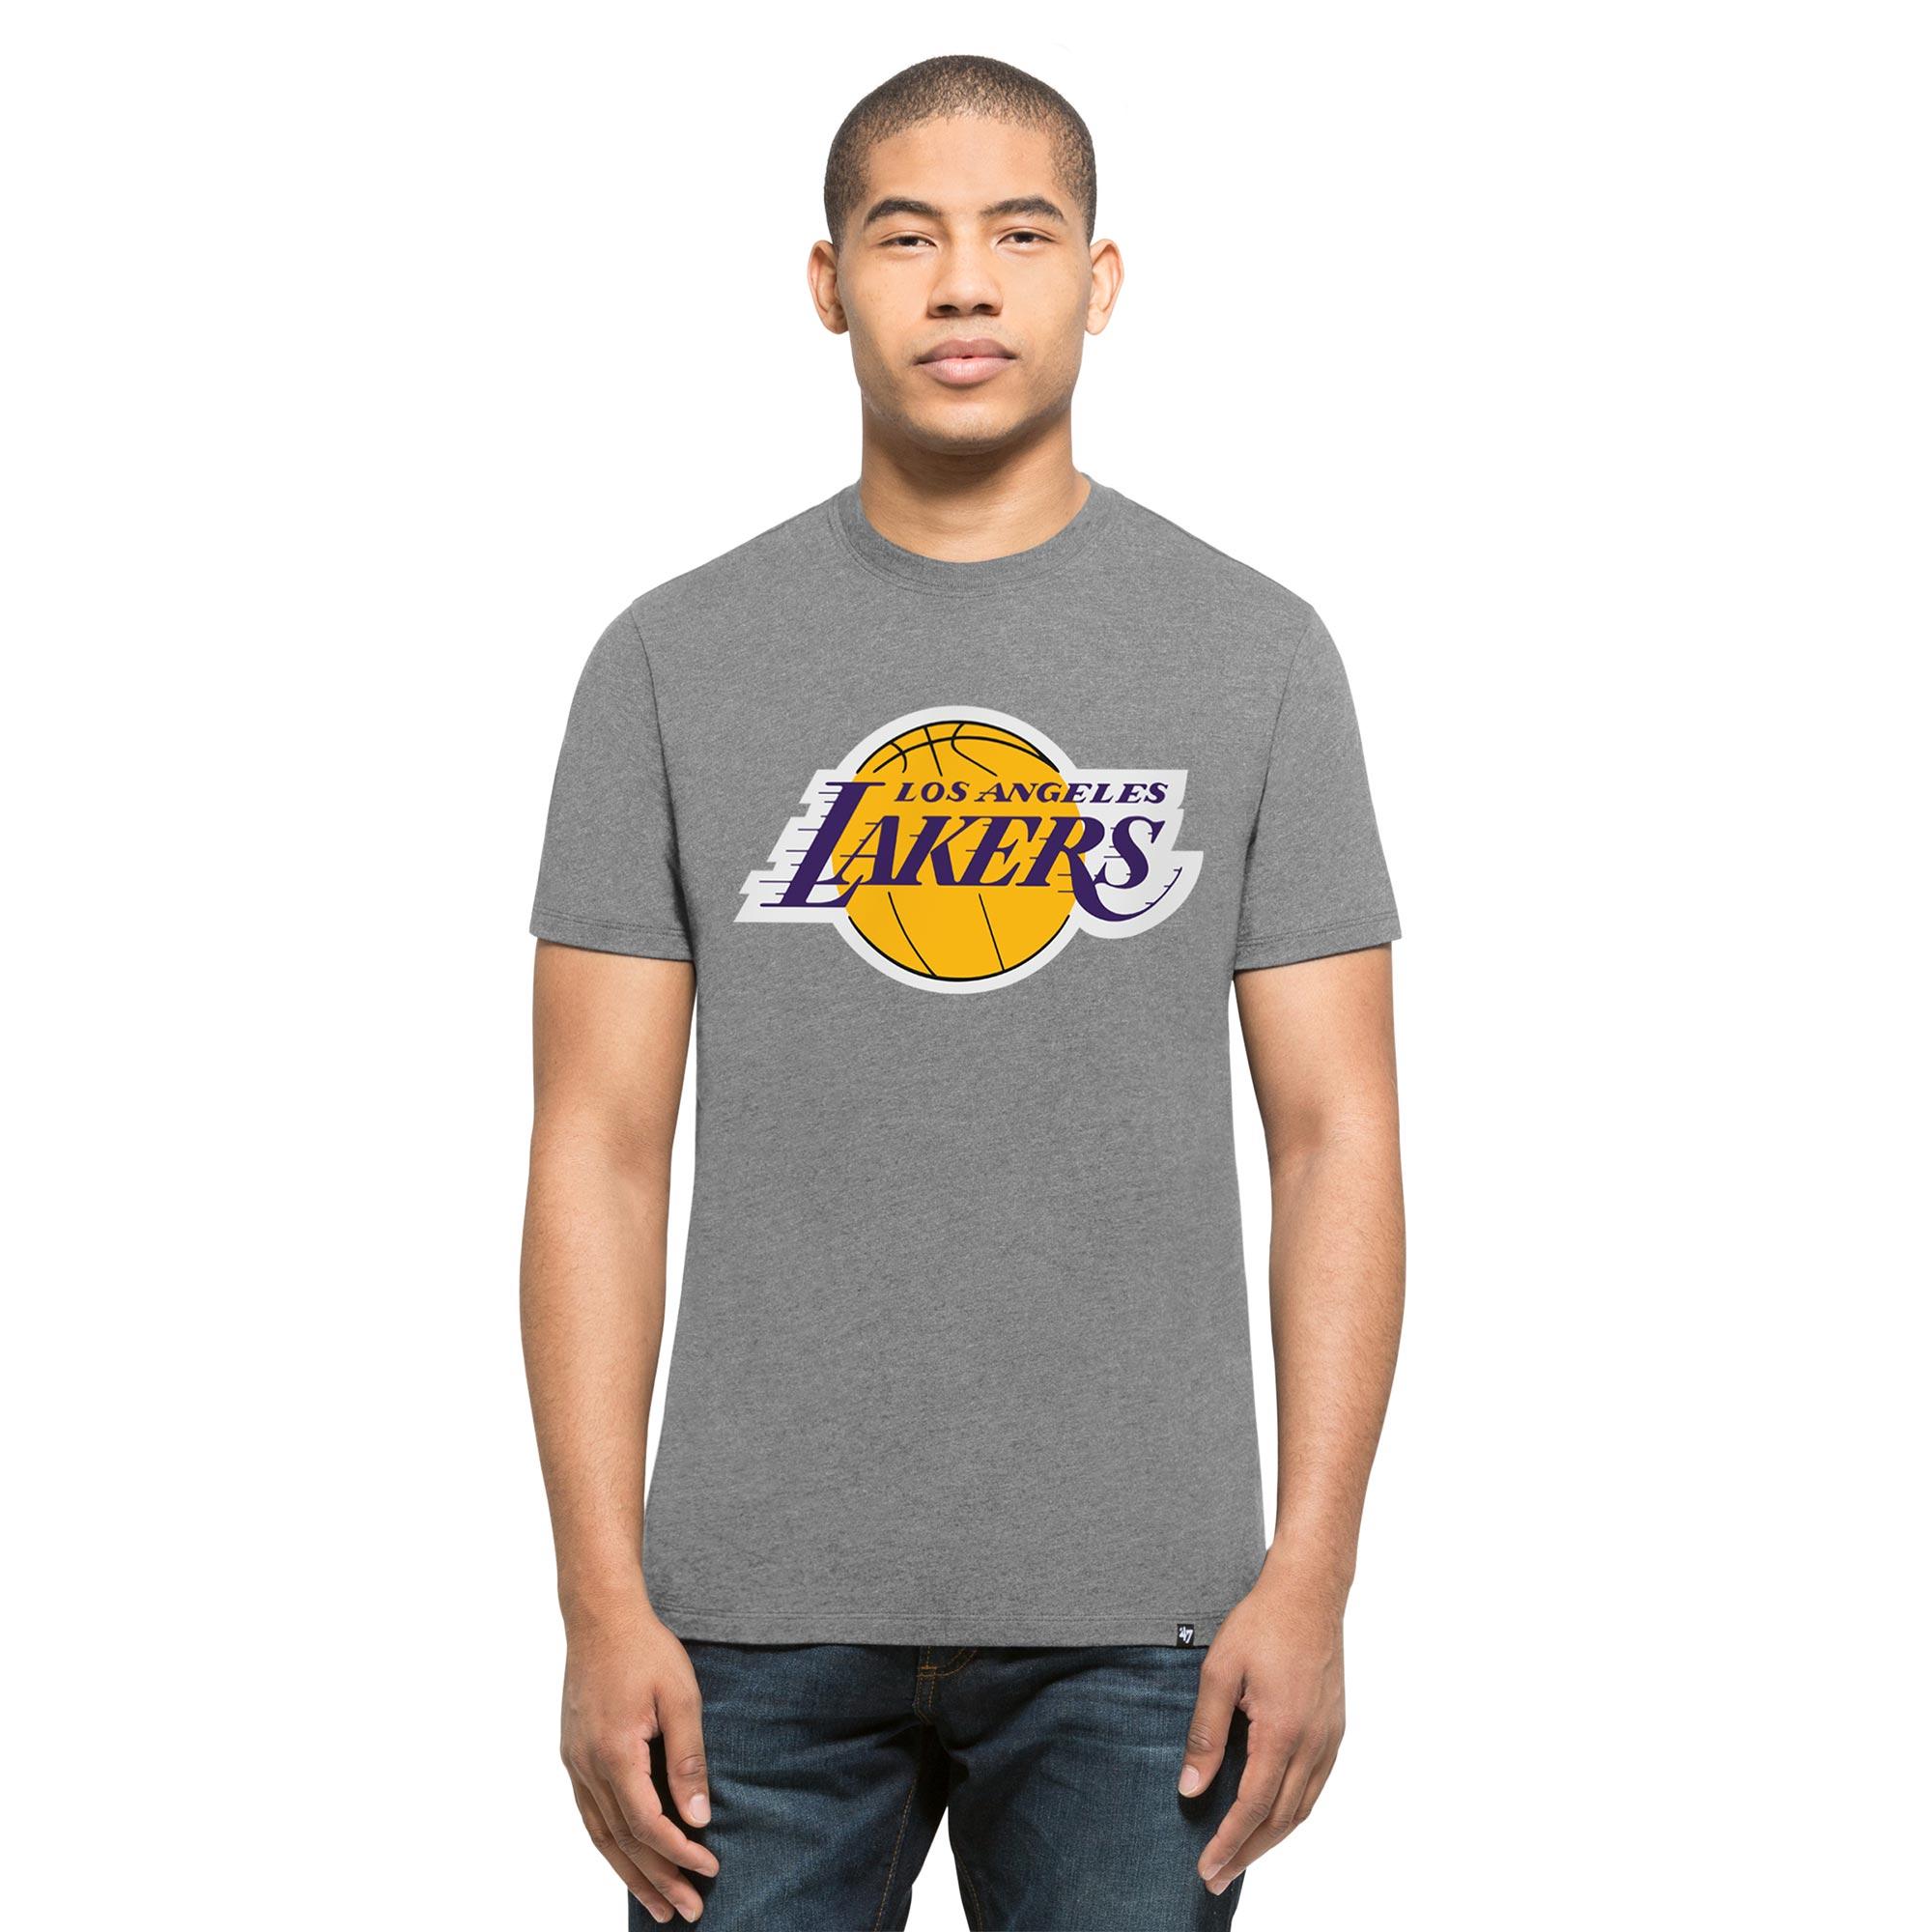 Los Angeles Lakers 47 Core Club T-Shirt - Mens